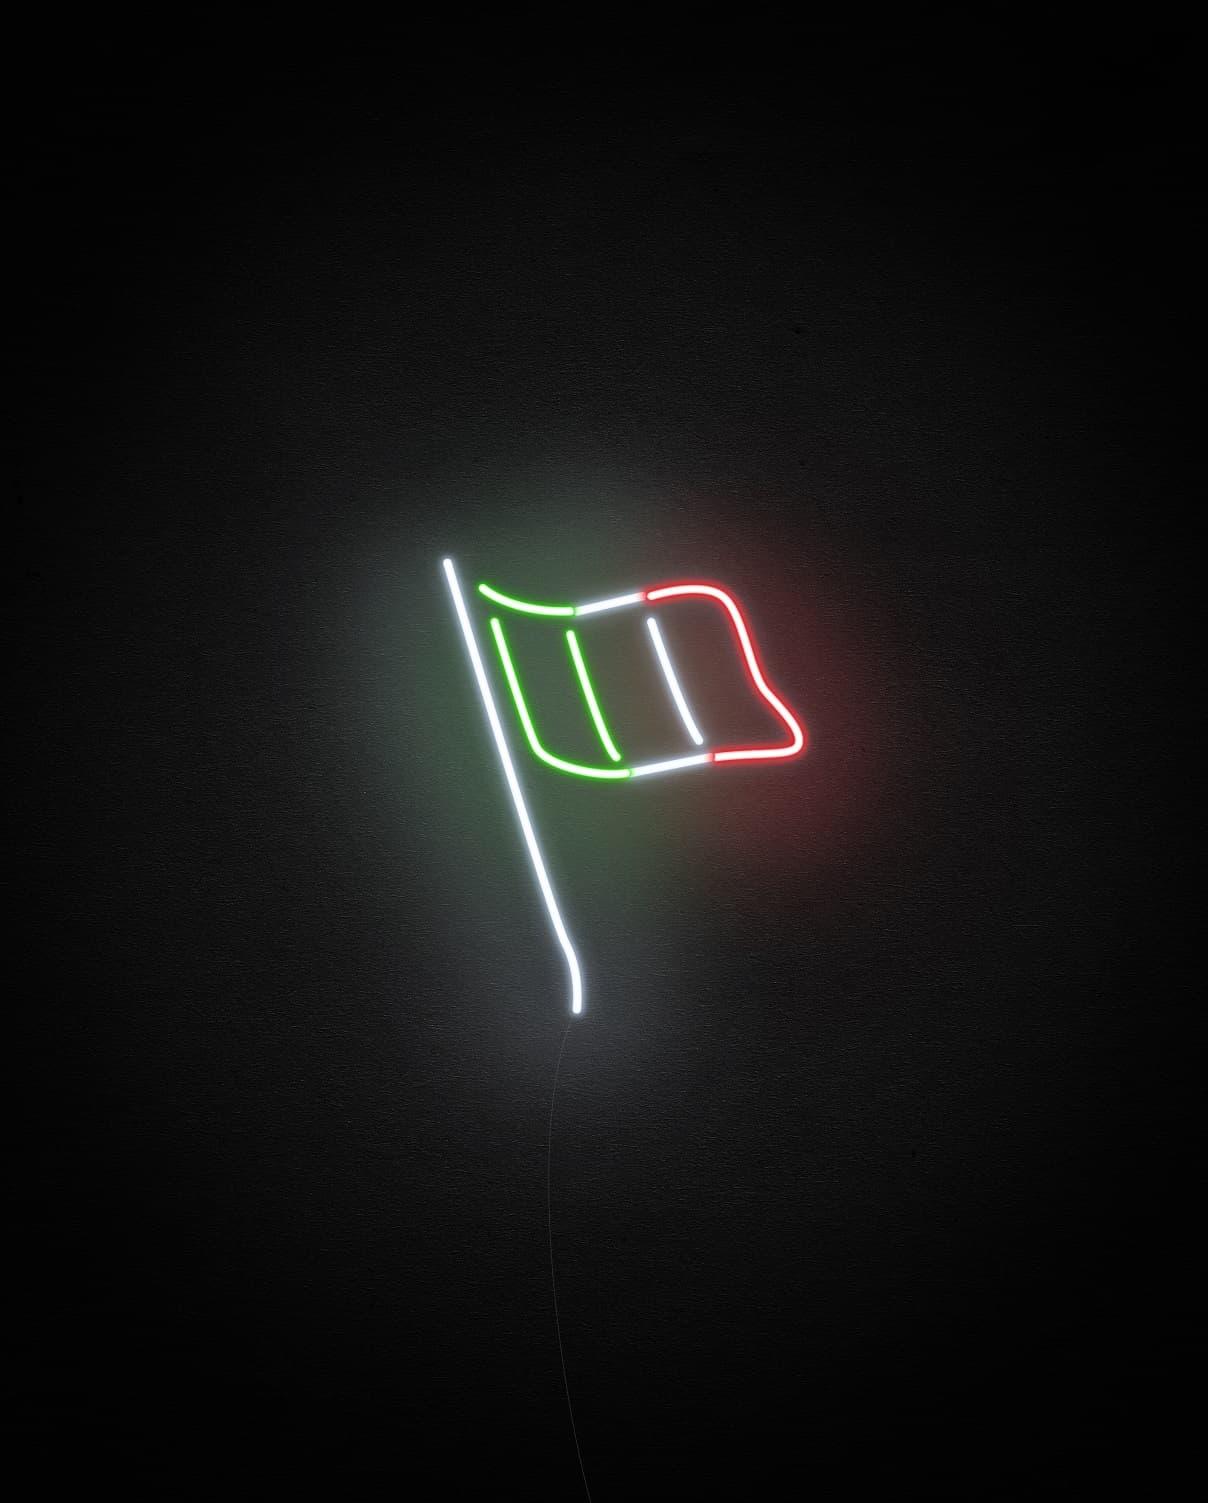 italy flag neon light